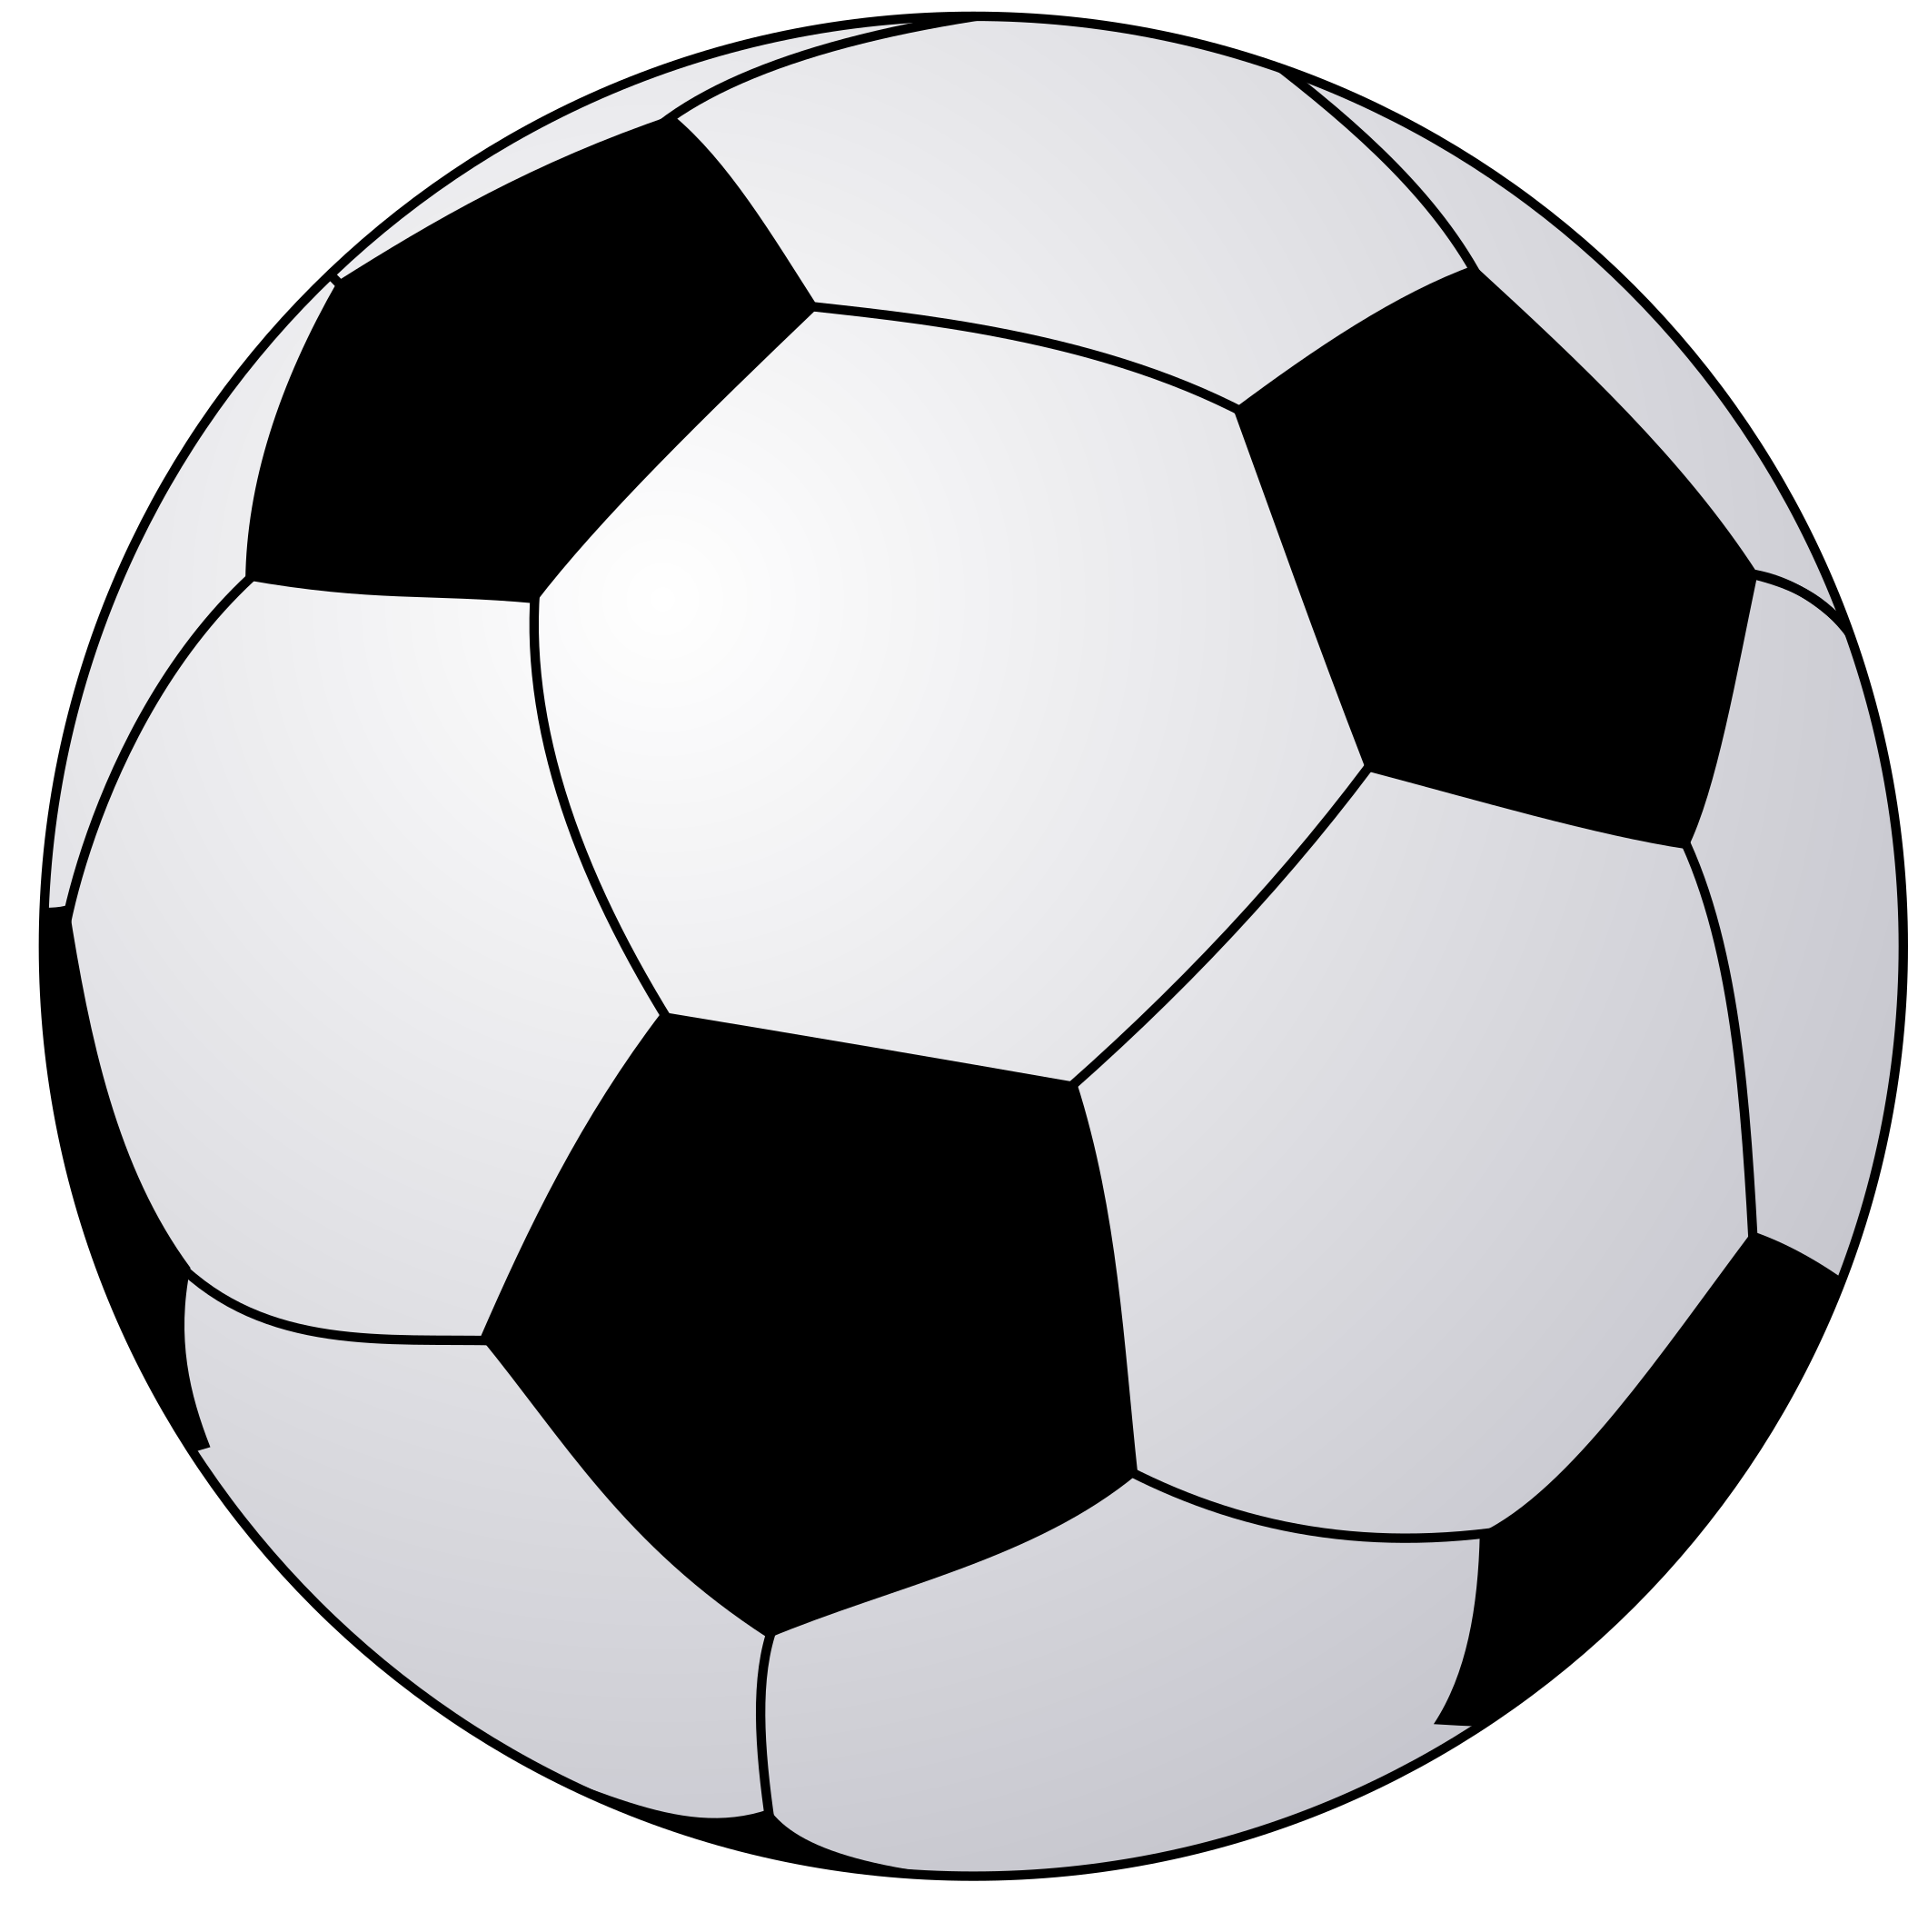 Soccer ball firecracker clipart png black and white download Football Clip art - soccer ball png download - 2100*2126 ... png black and white download